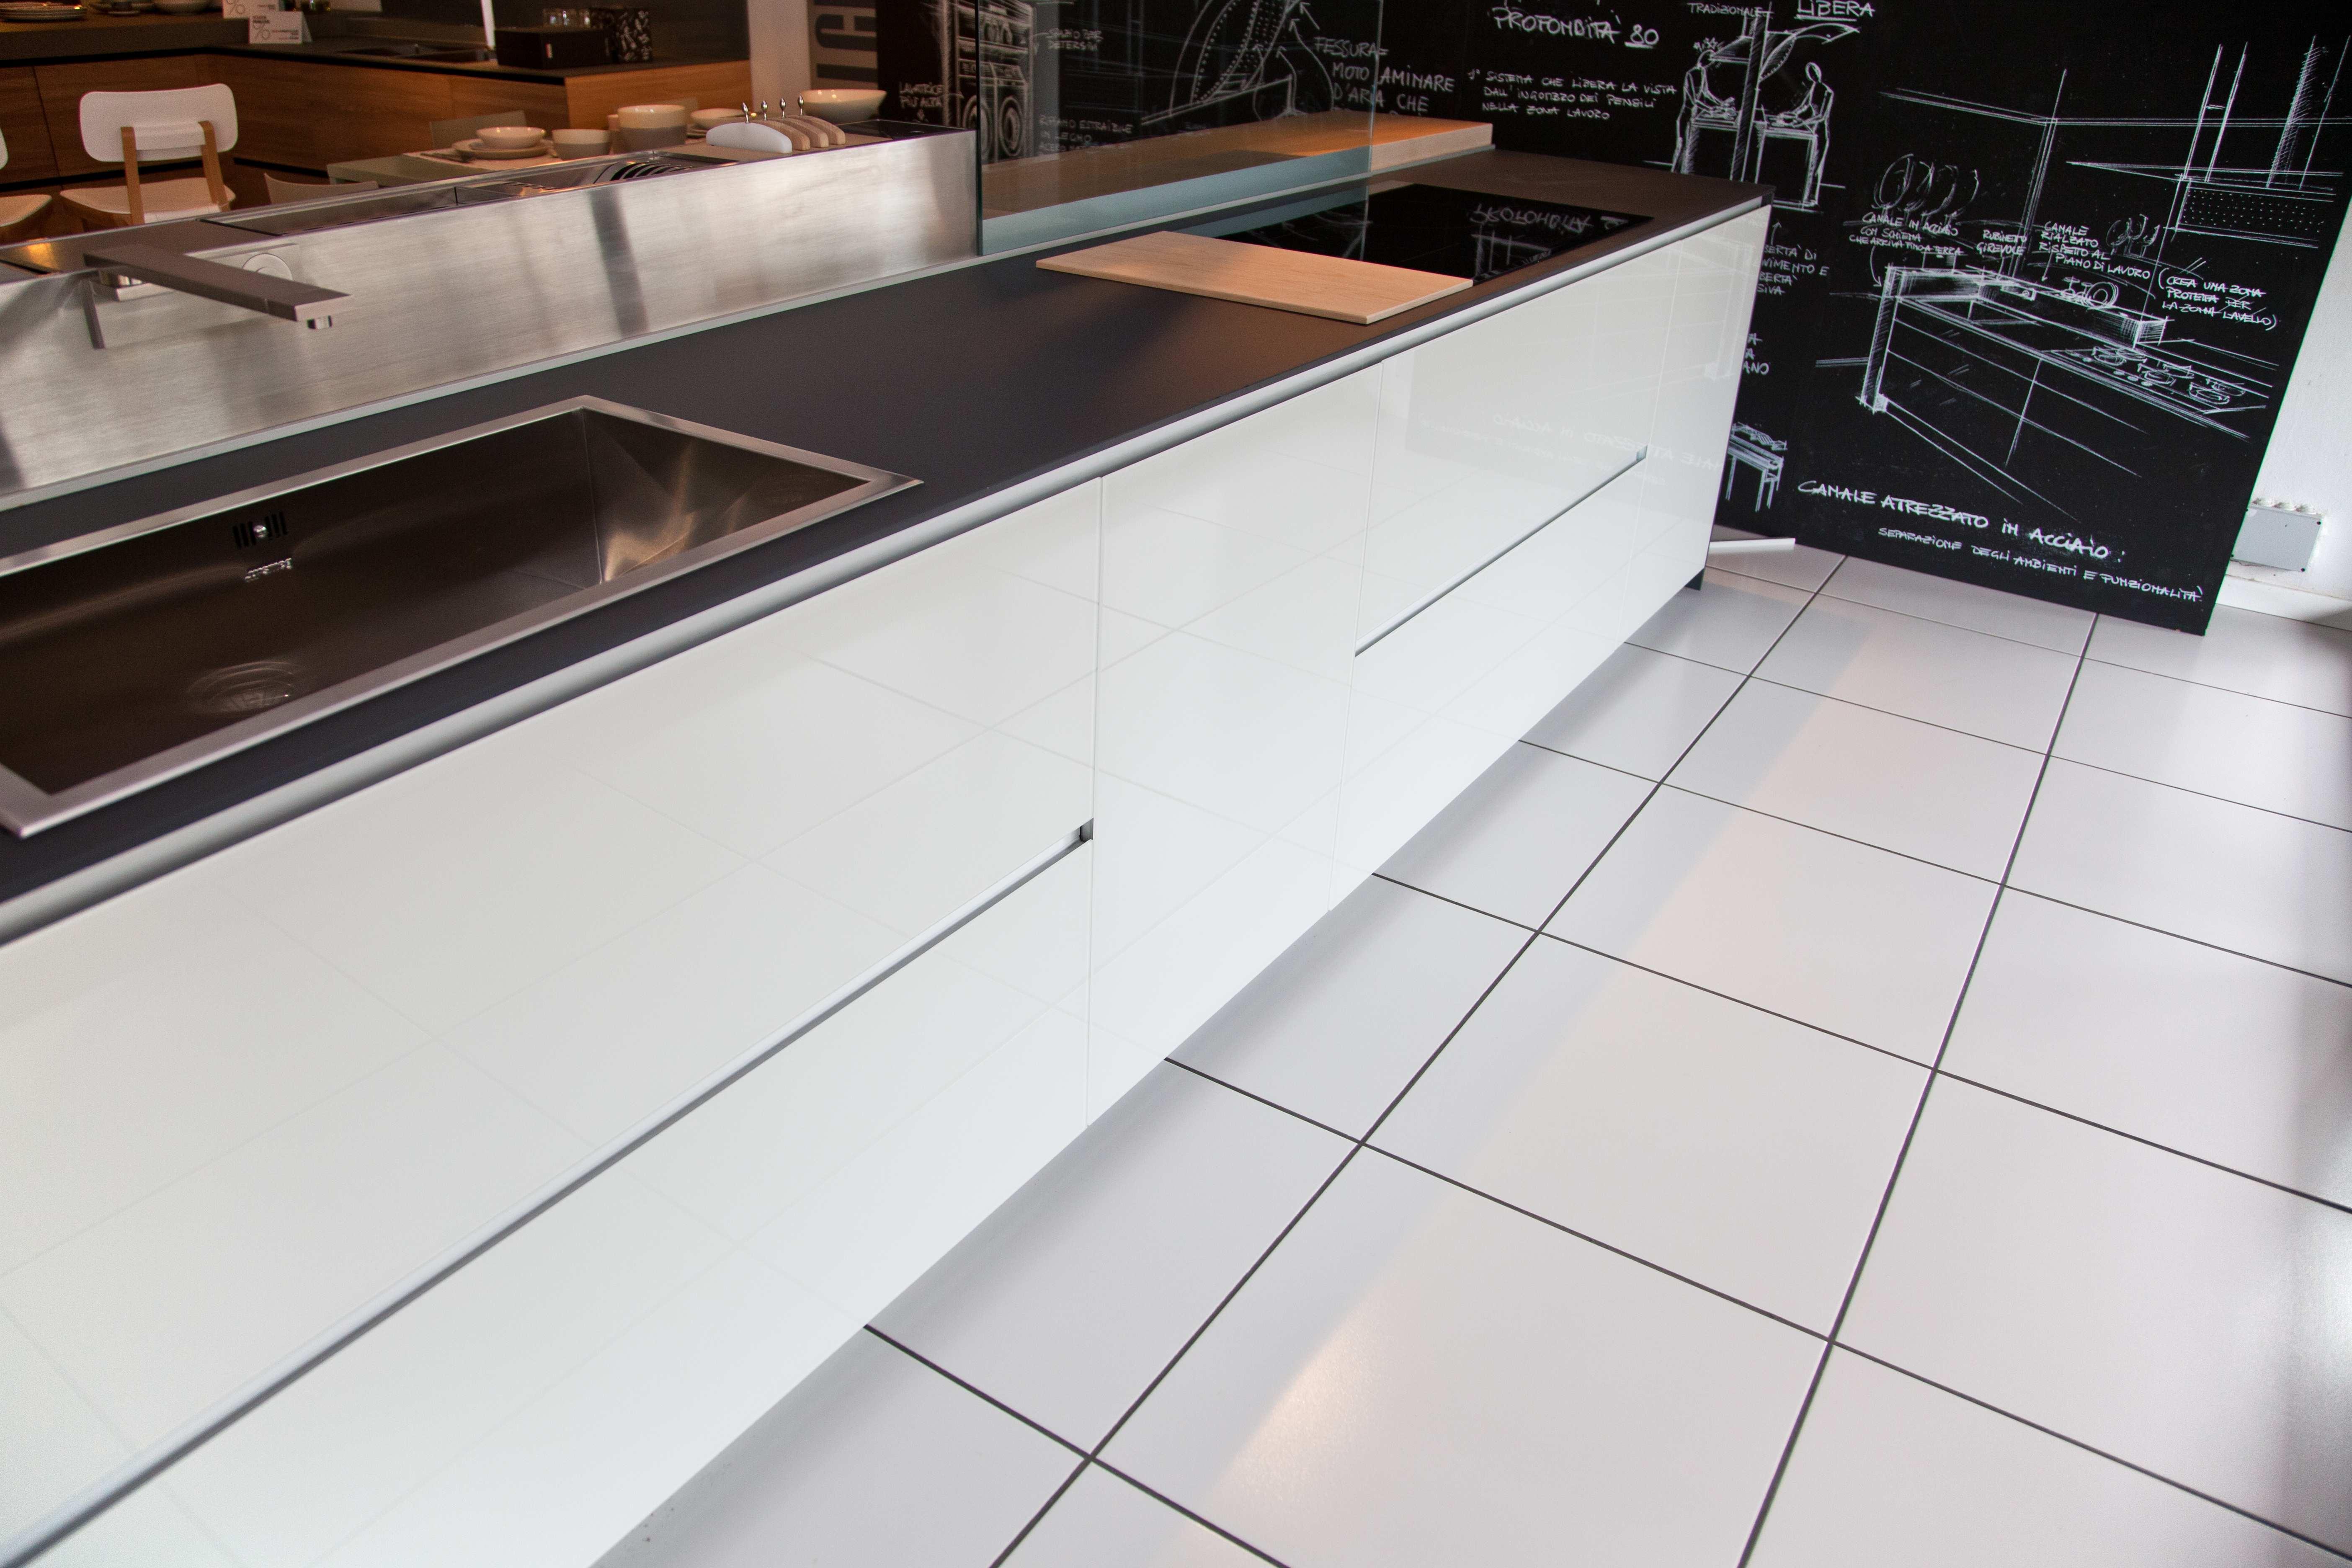 Cucina valcucine artematica vitrum bianco lucido con - Cucina bianco lucido ...